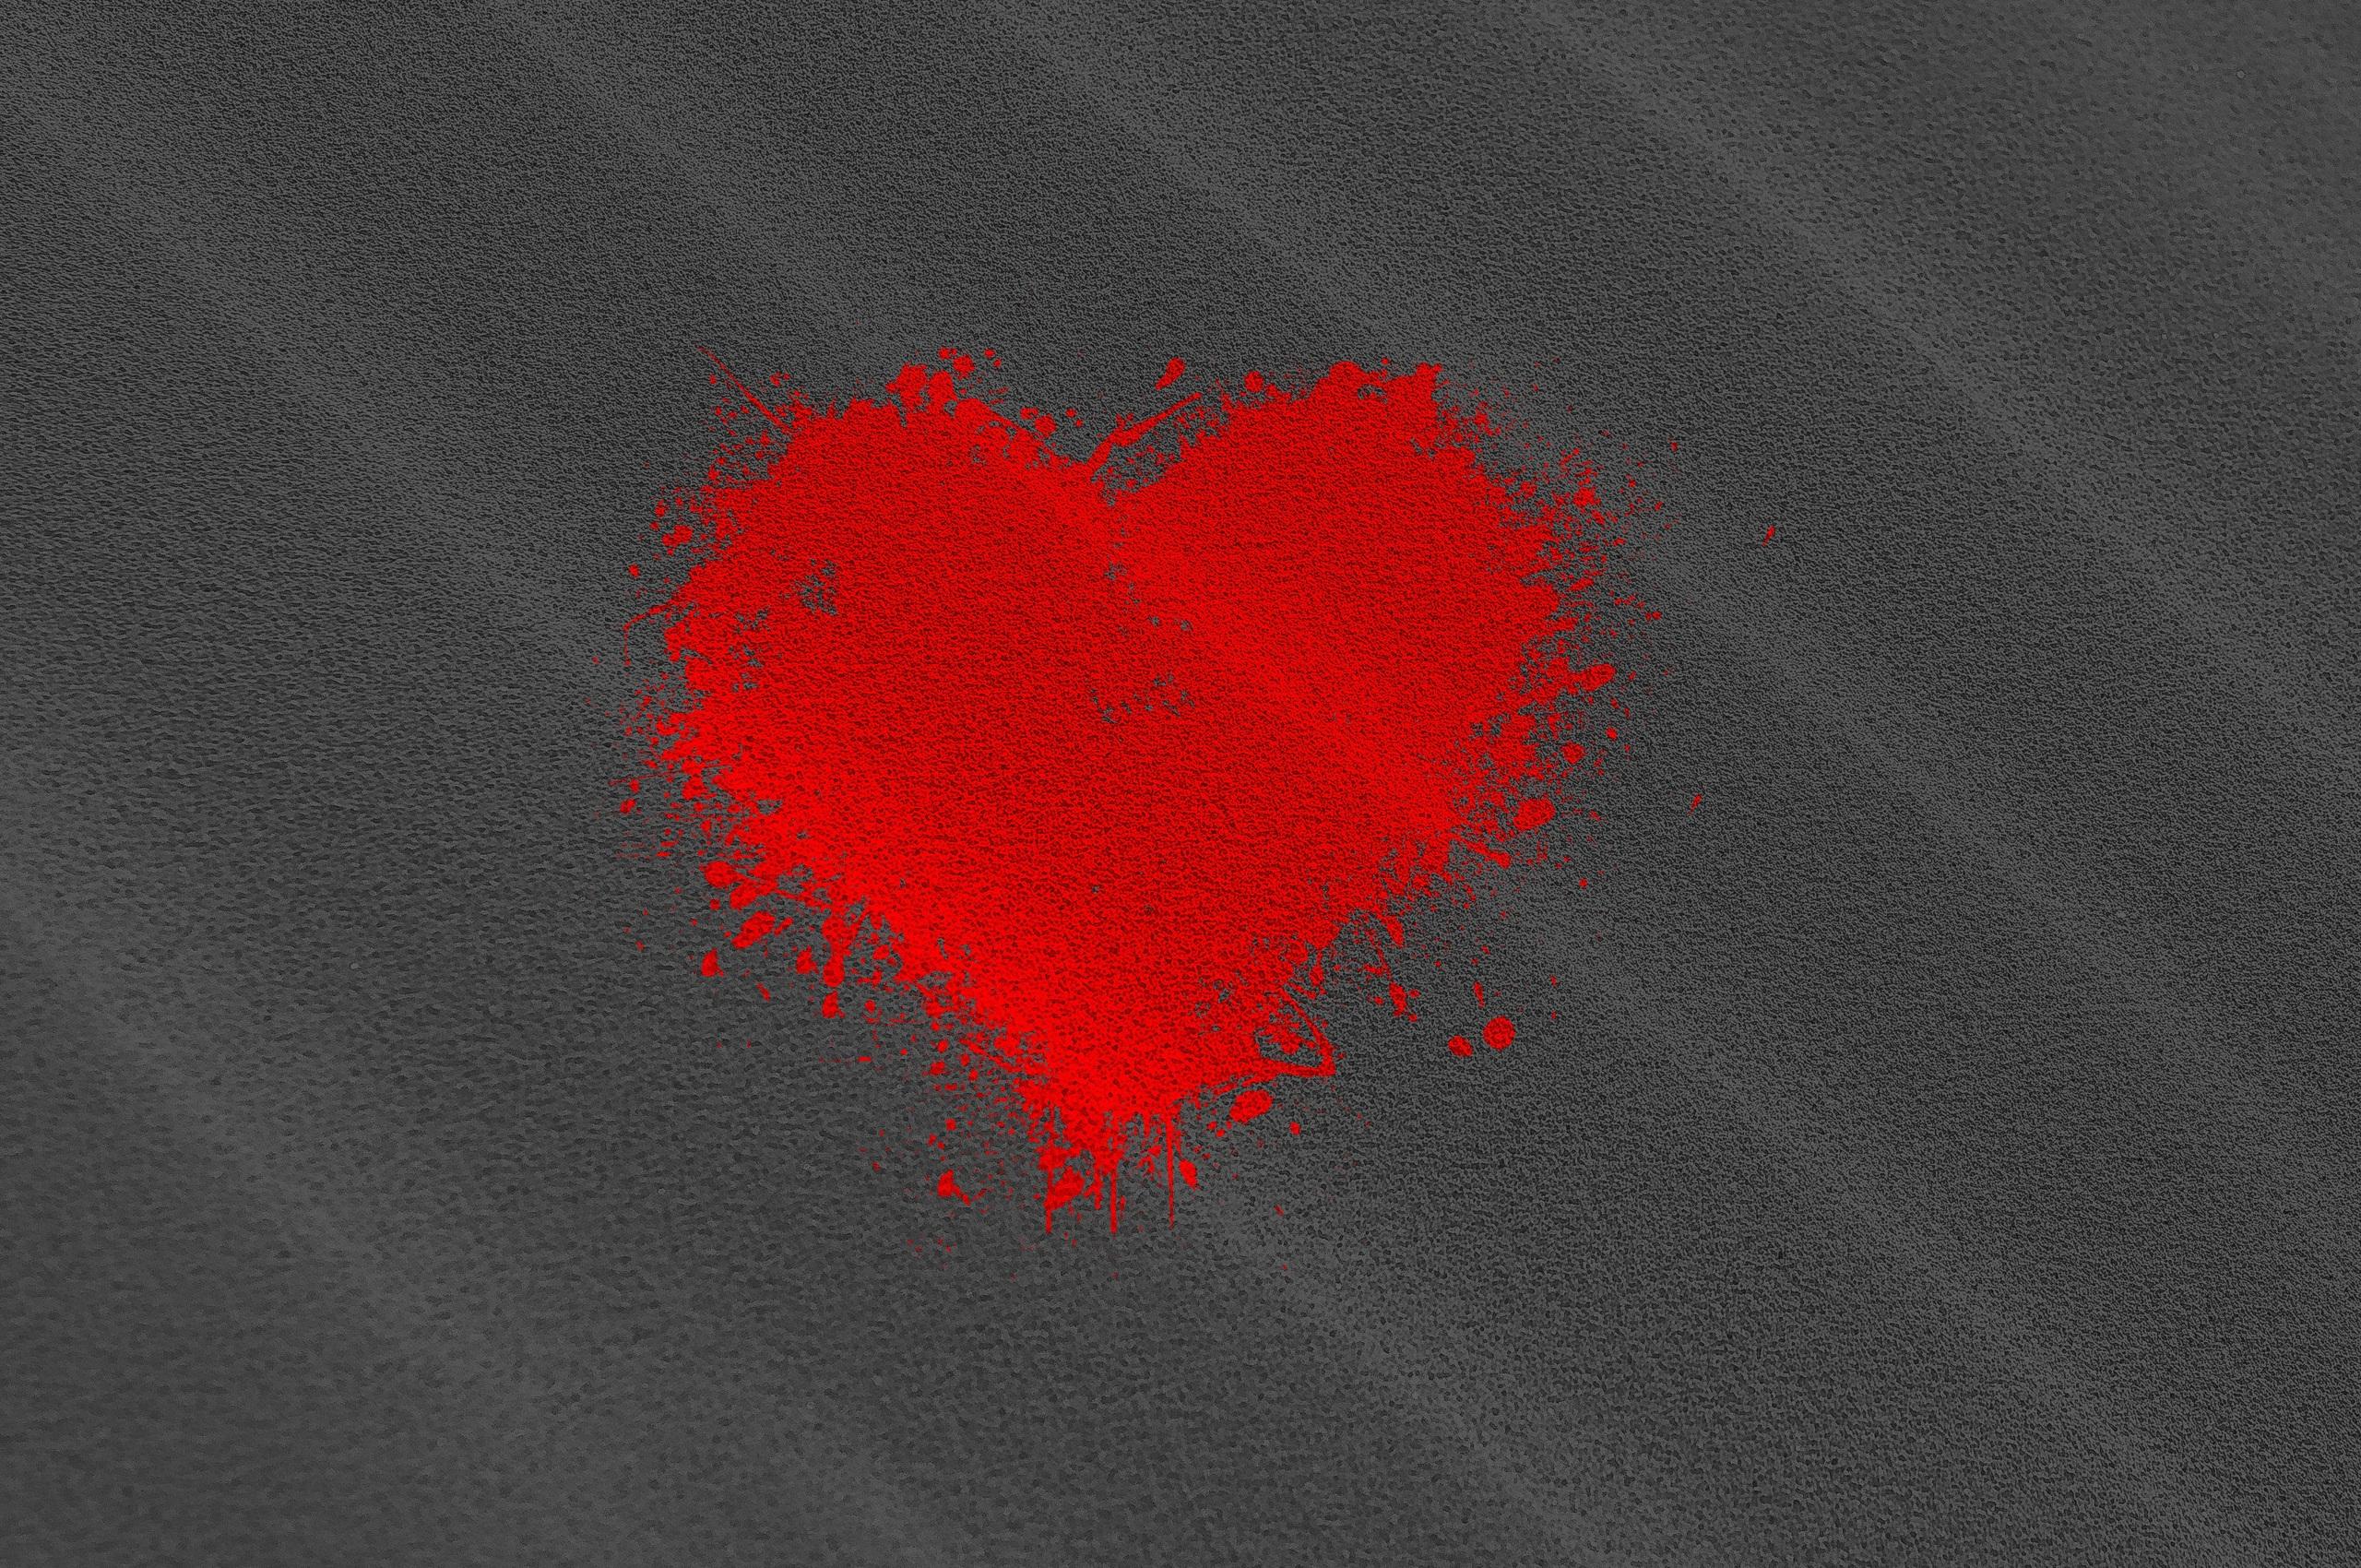 heart-texture-background-4k-5h.jpg